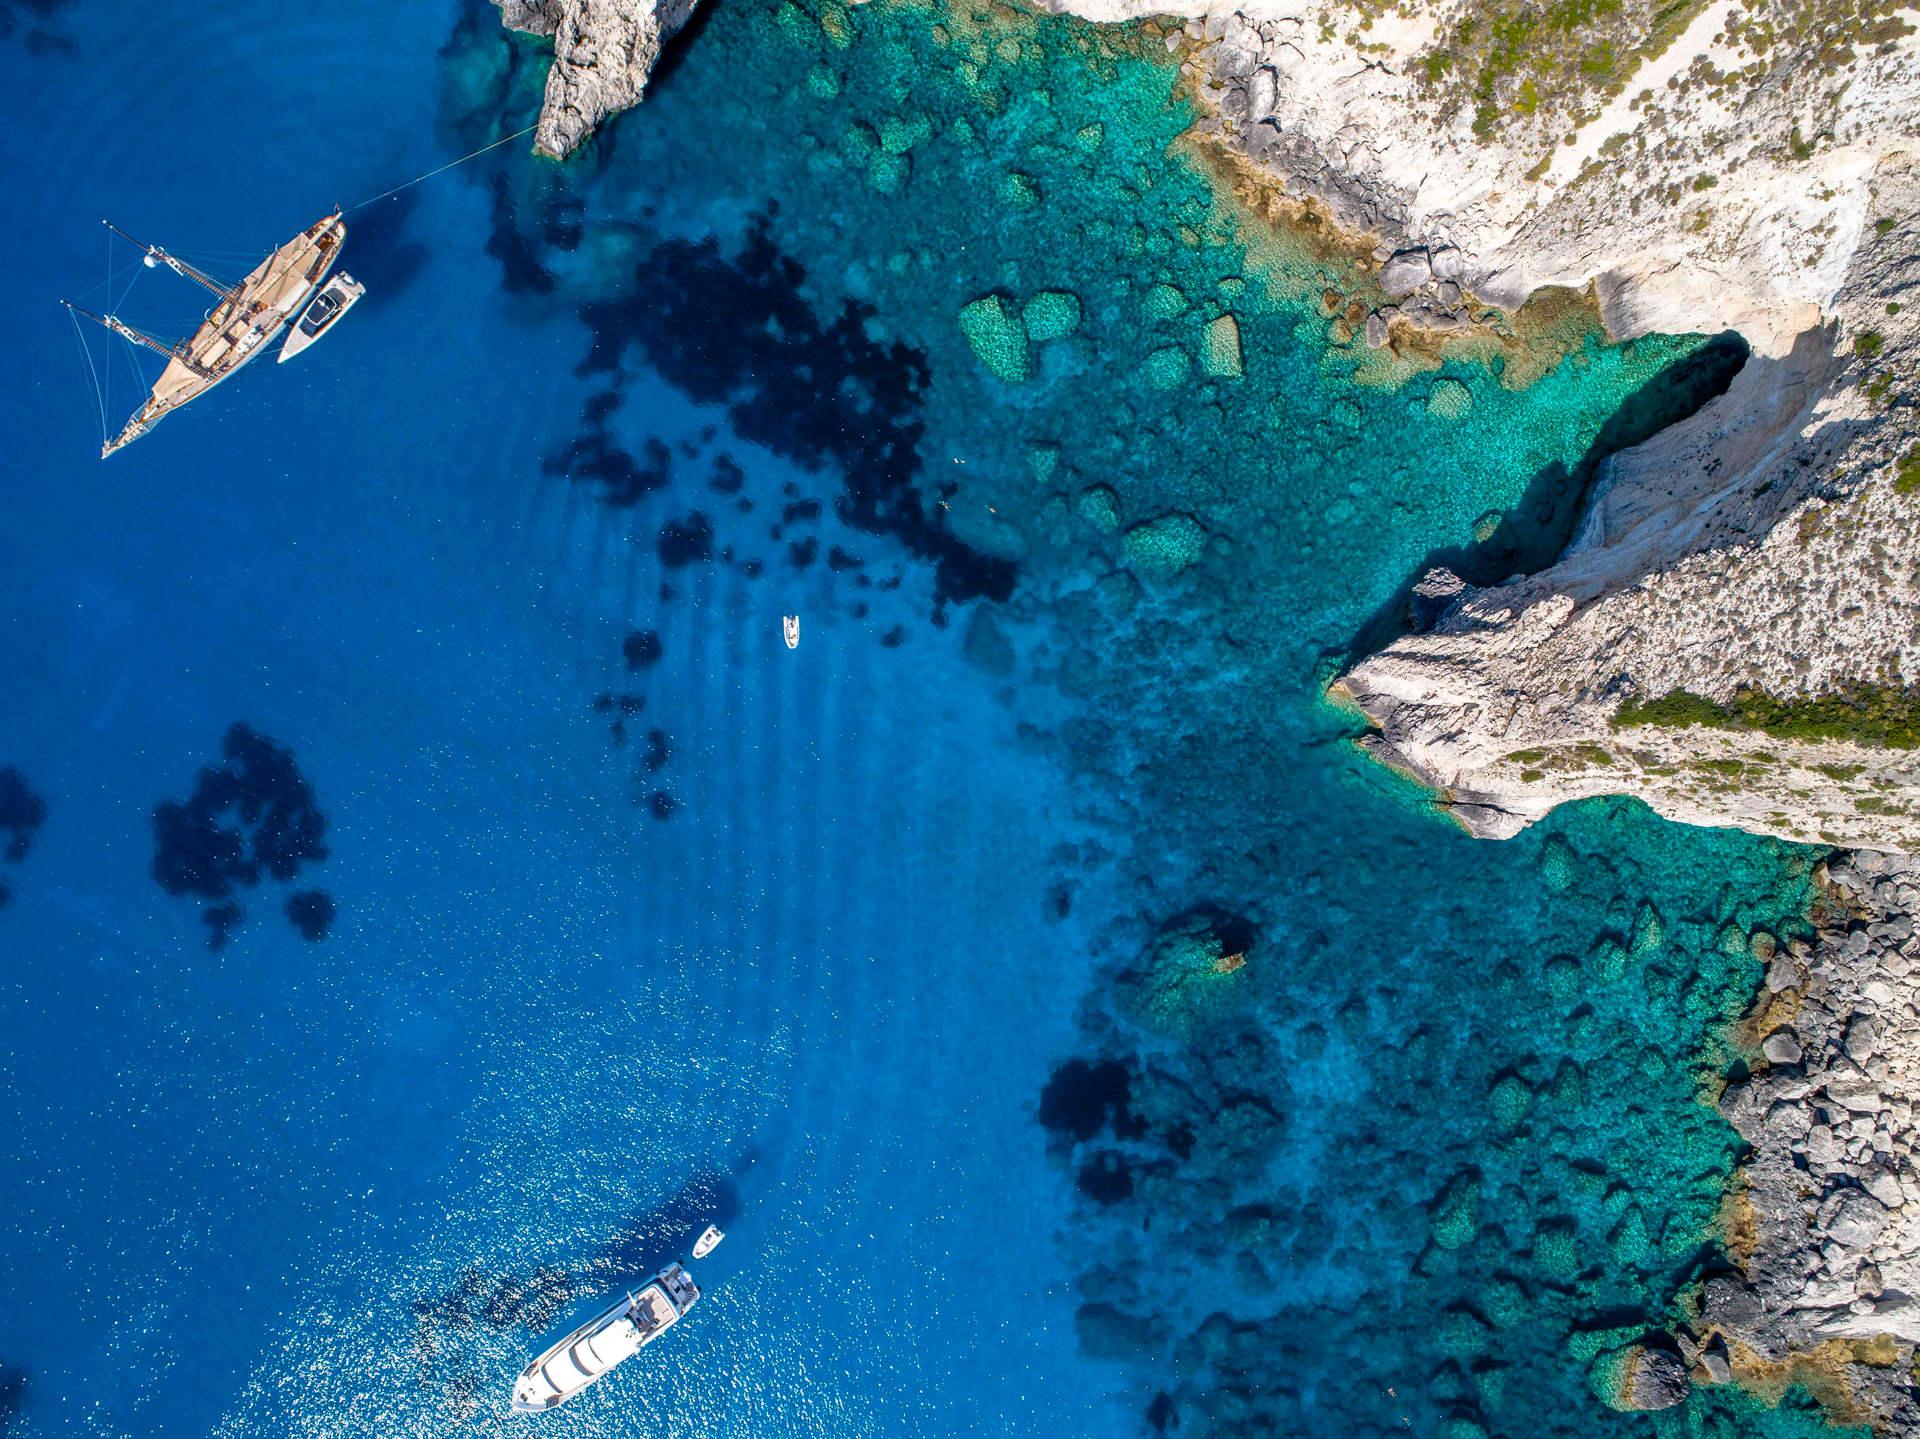 'Blue Lagoon', Calypso Beach, Othonoi, Greece